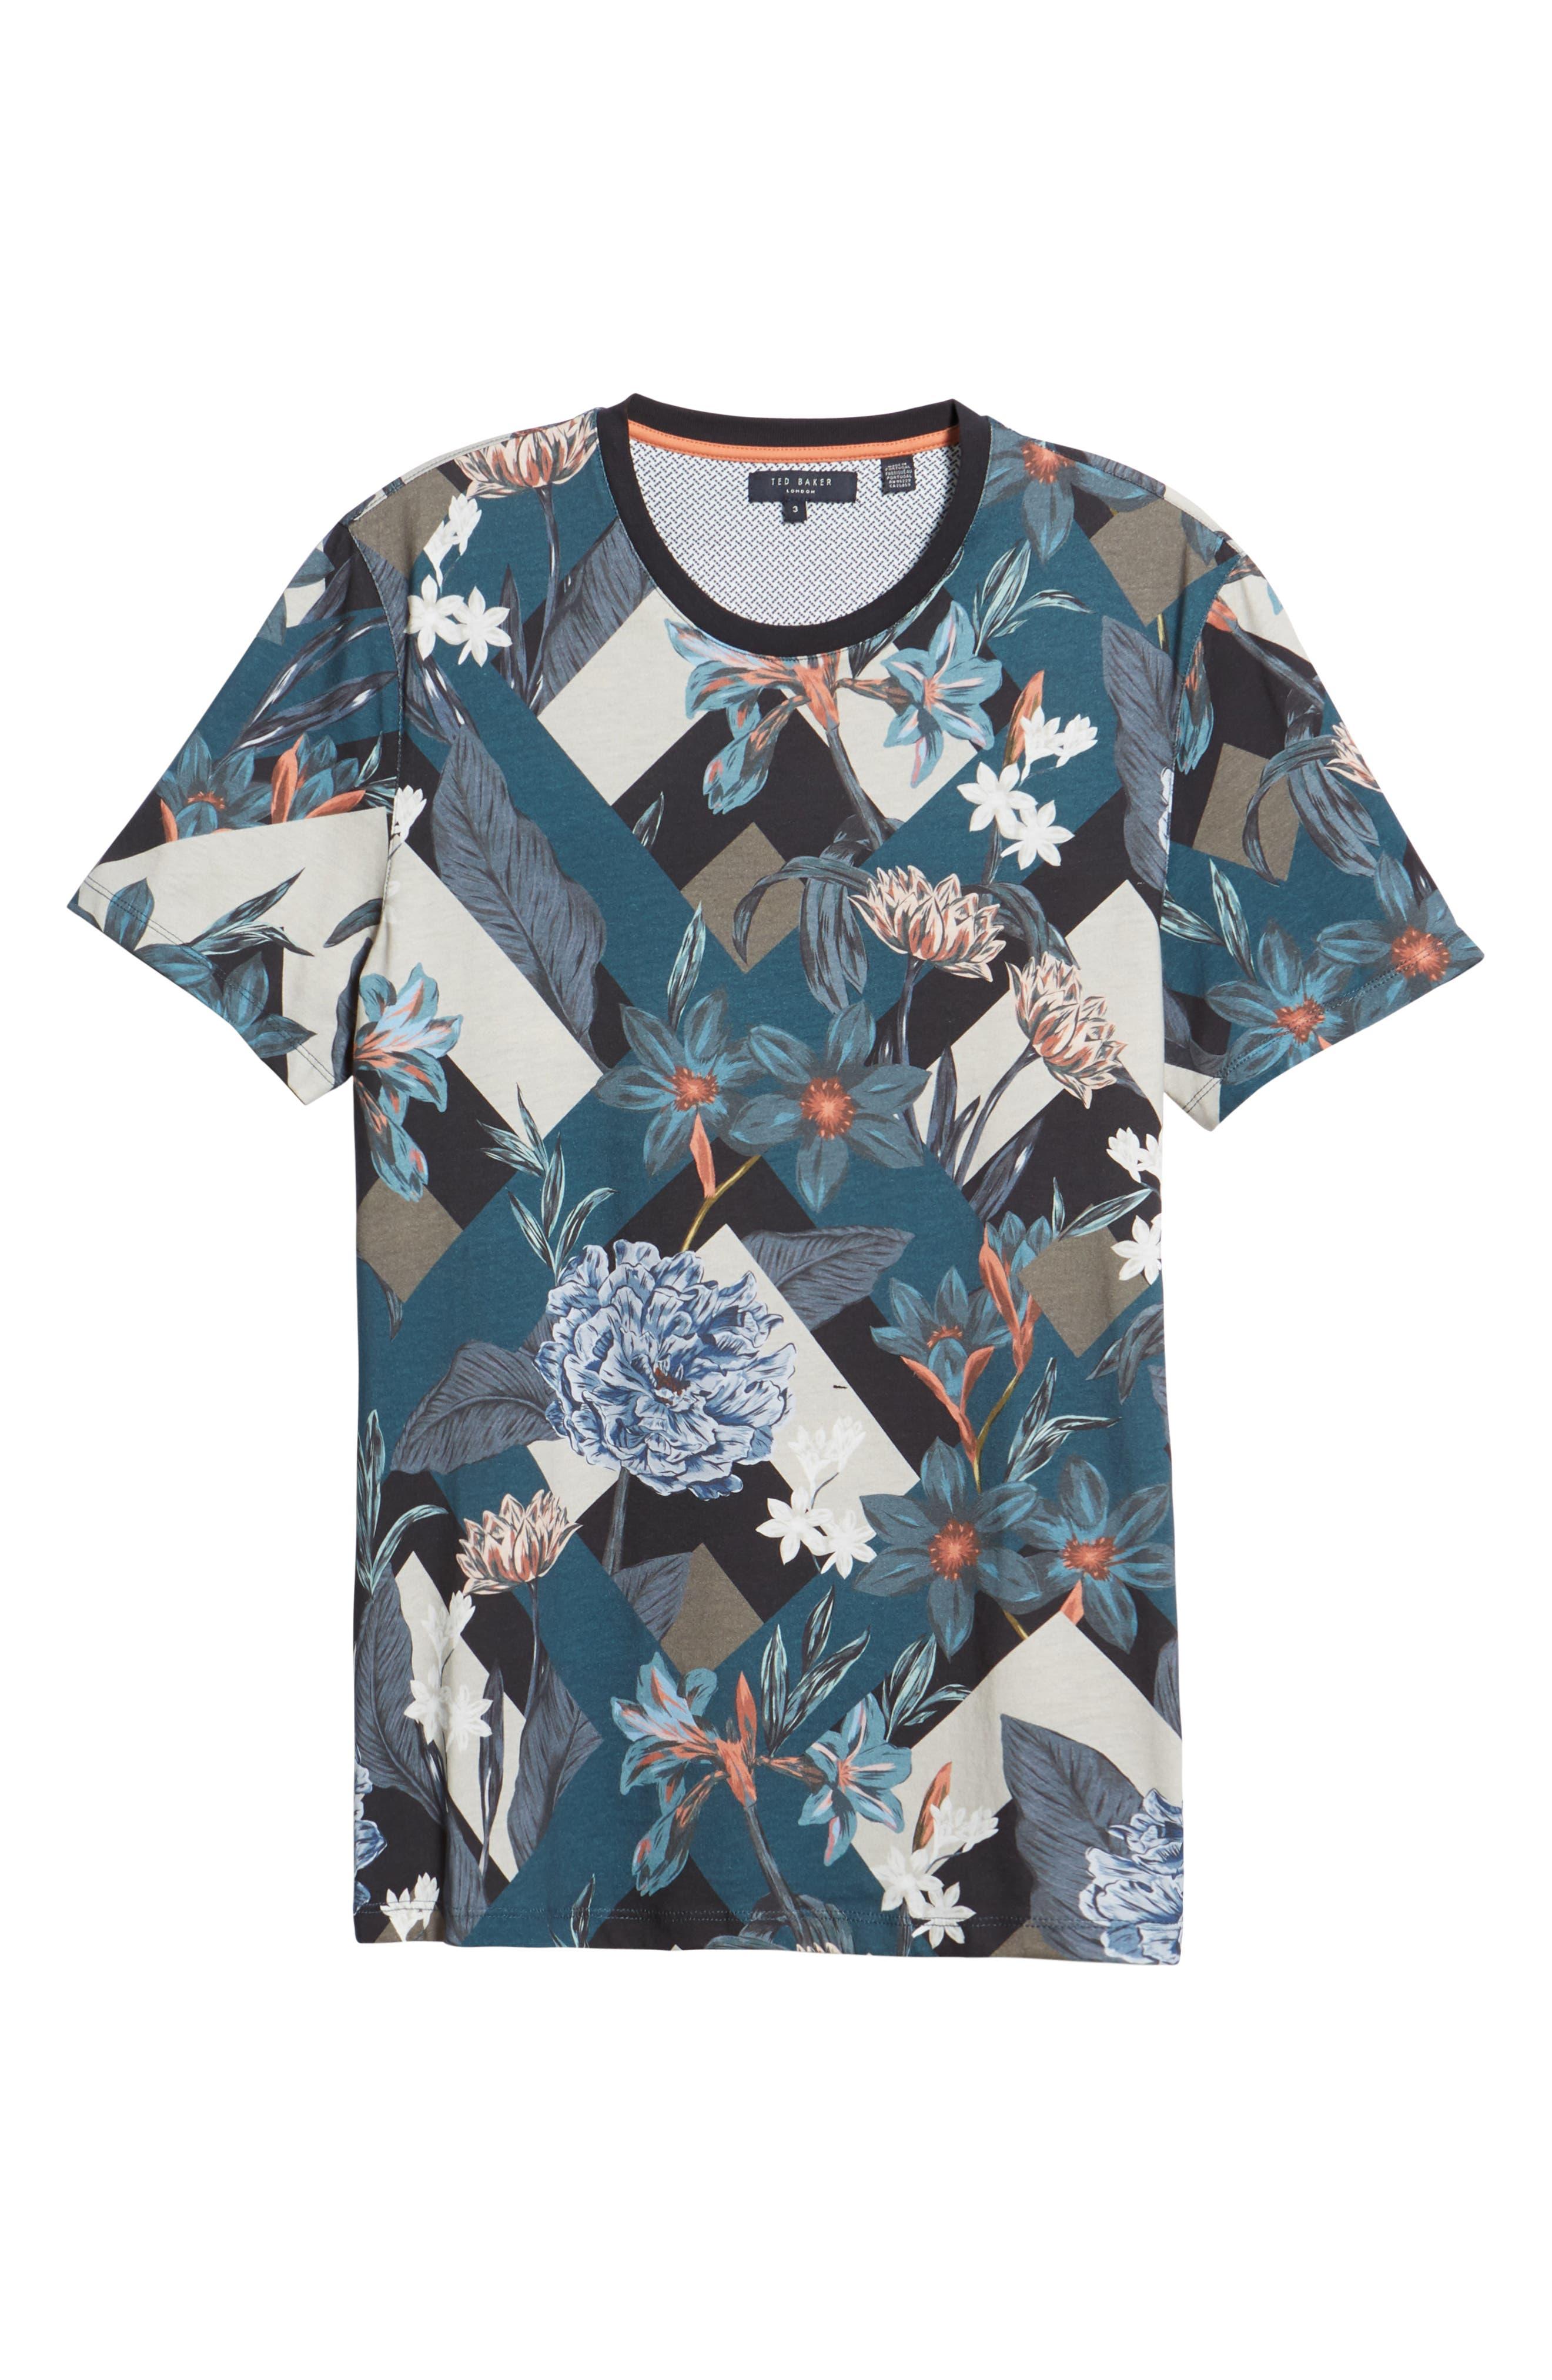 Jolly Slim Fit T-Shirt,                             Alternate thumbnail 6, color,                             410